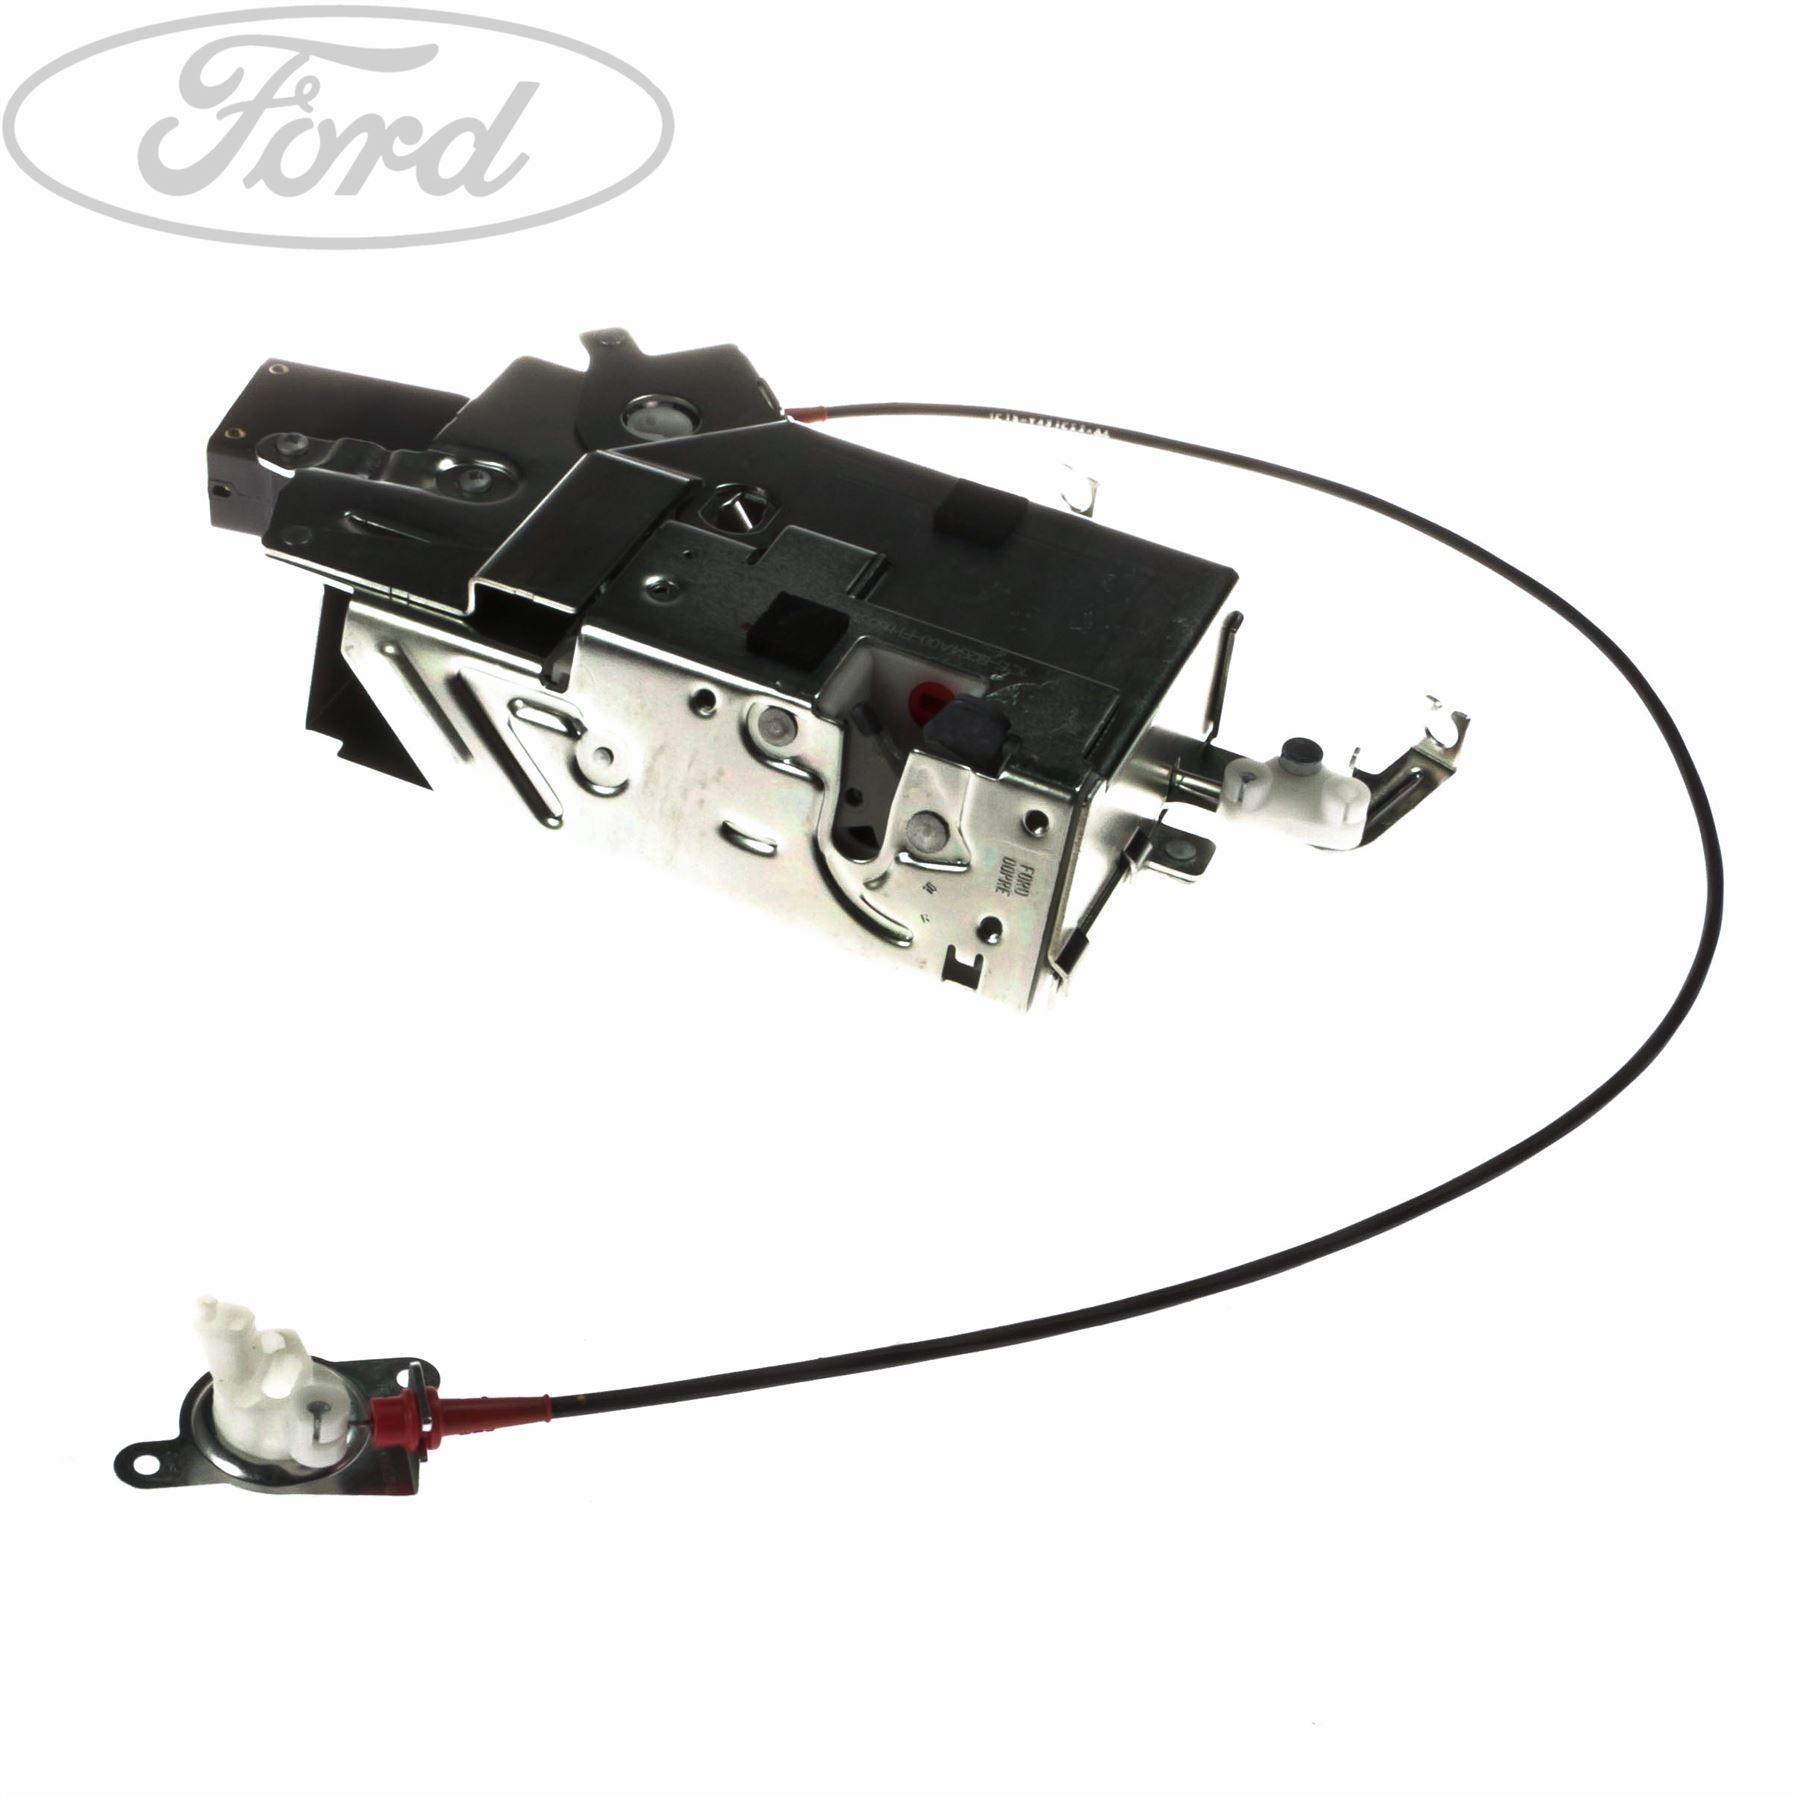 Genuine Ford Transit Mk Iv Os Sliding Side Door Lock 1766549 Ebay